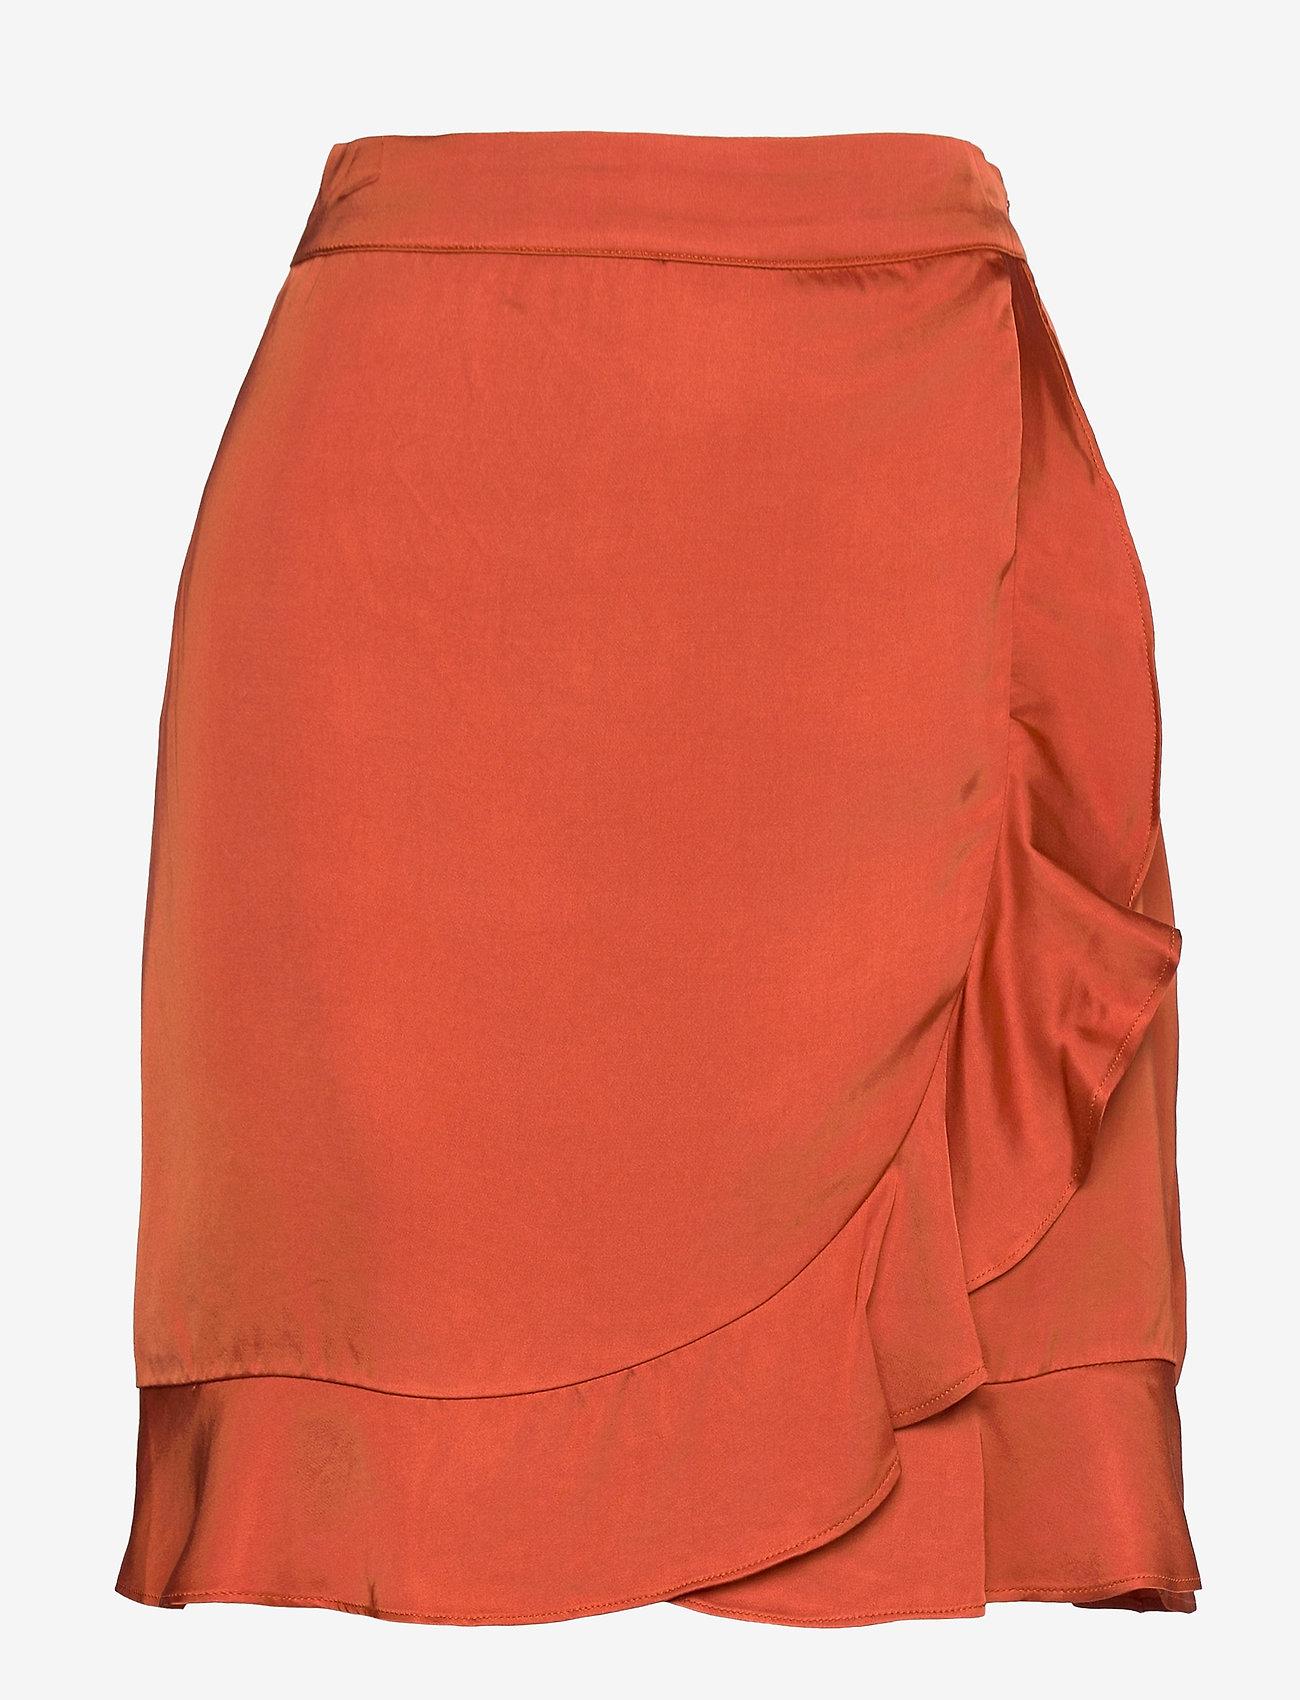 Deena Skirt (Burnt Henna) (117 €) - By Malina u1A8z